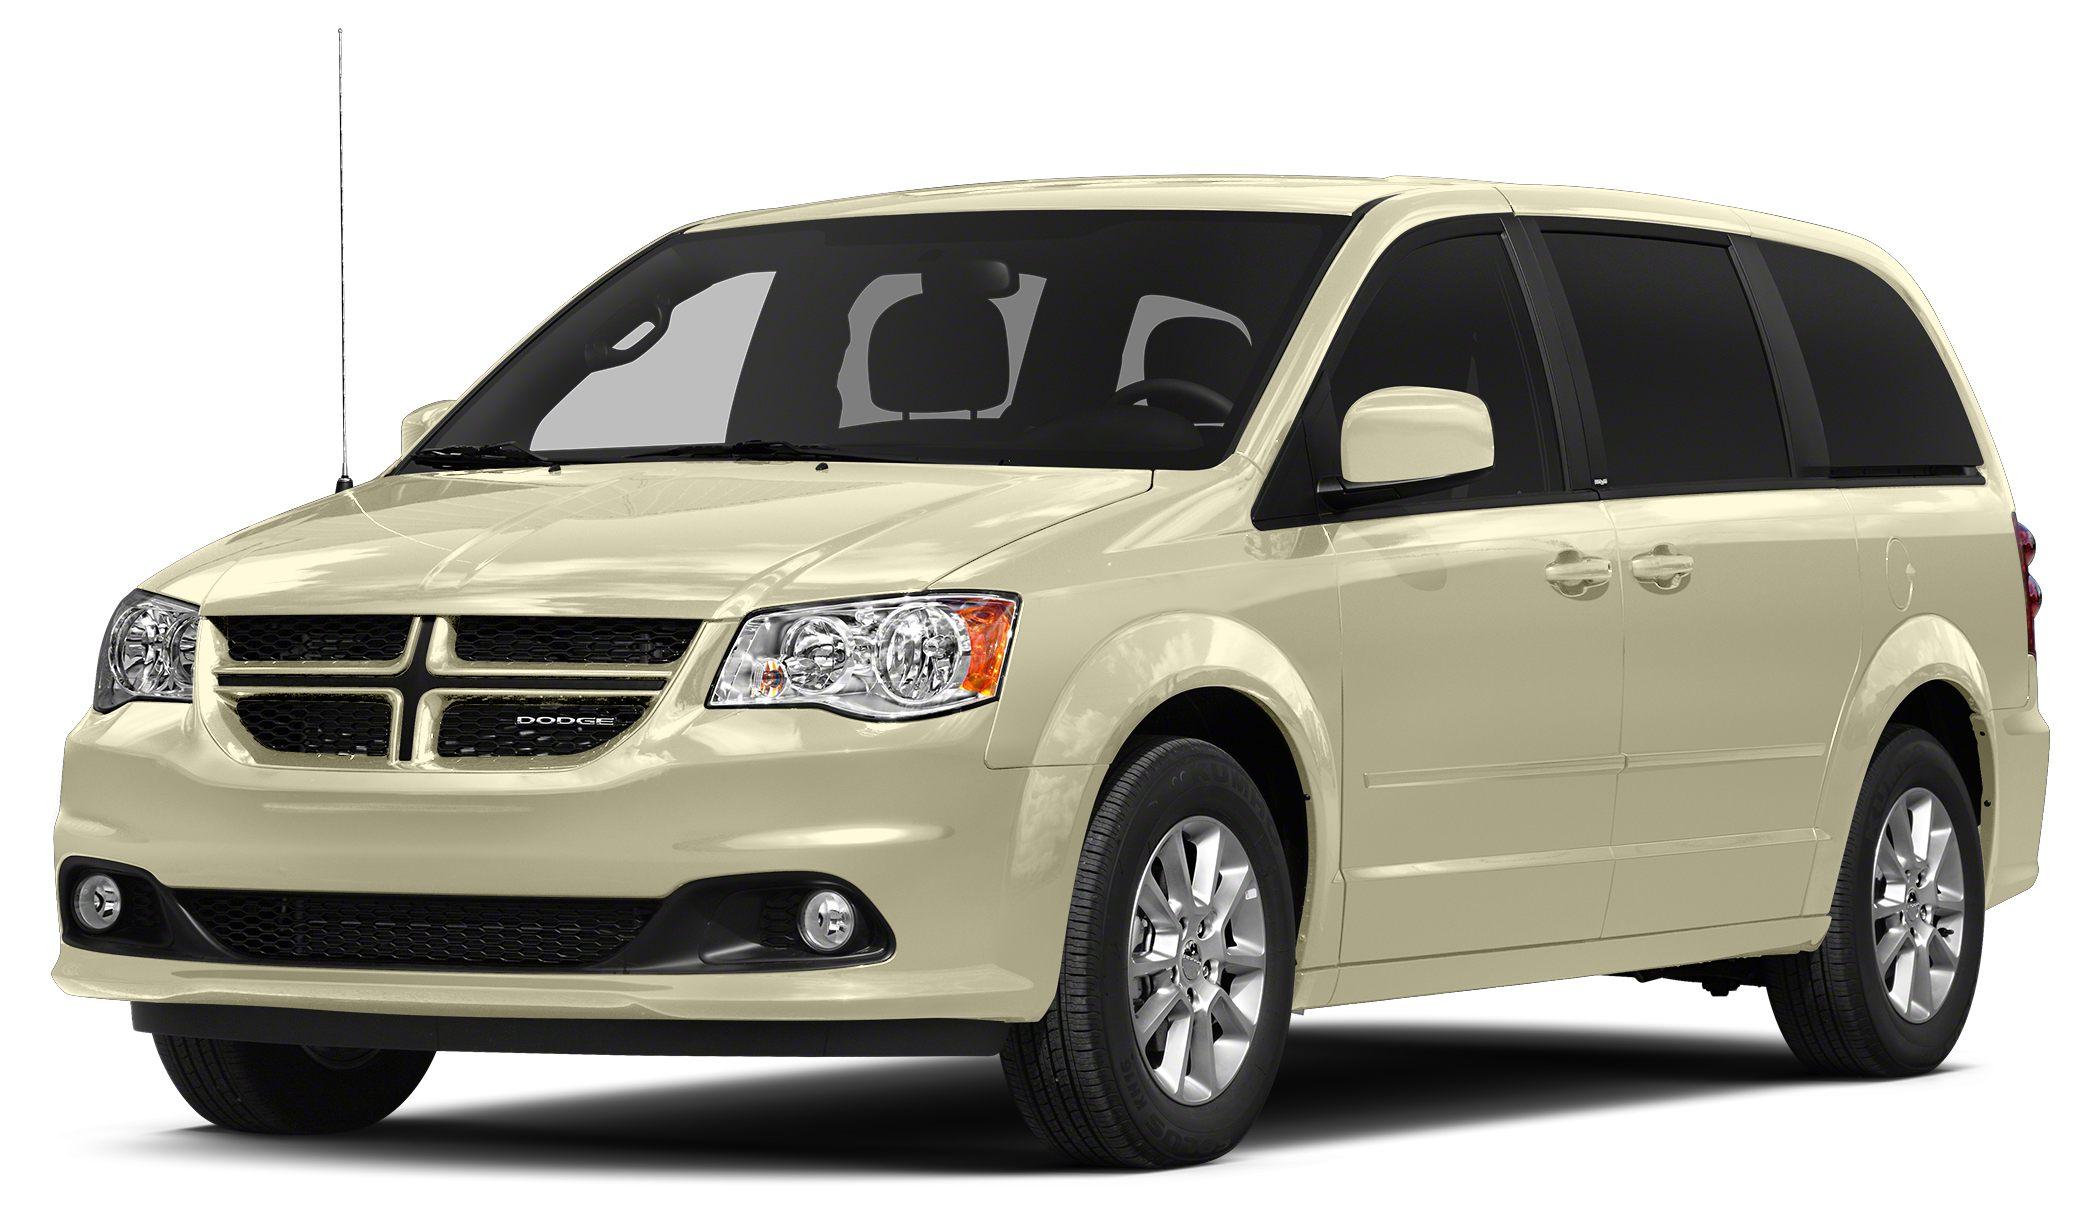 2016 Dodge Grand Caravan RT Miles 21228Color Beige Stock 58139 VIN 2C4RDGEG7GR224781